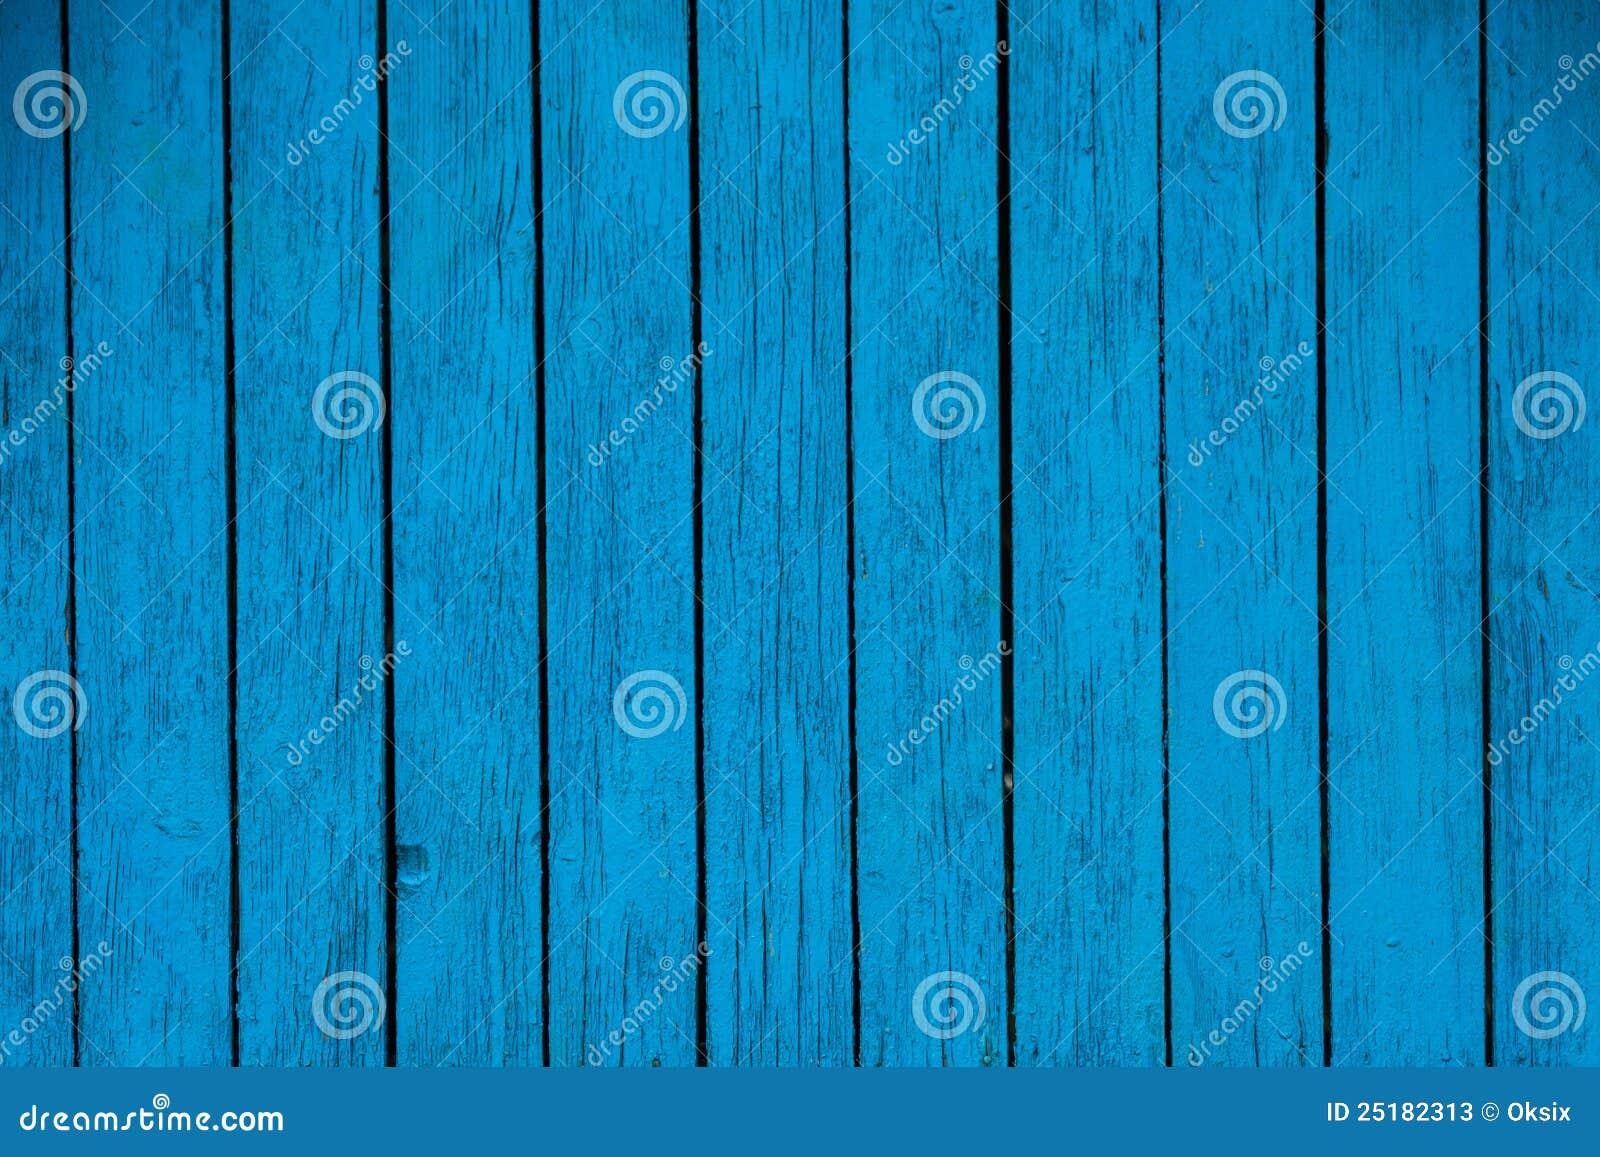 Blue Wood Stock Photos Image 25182313